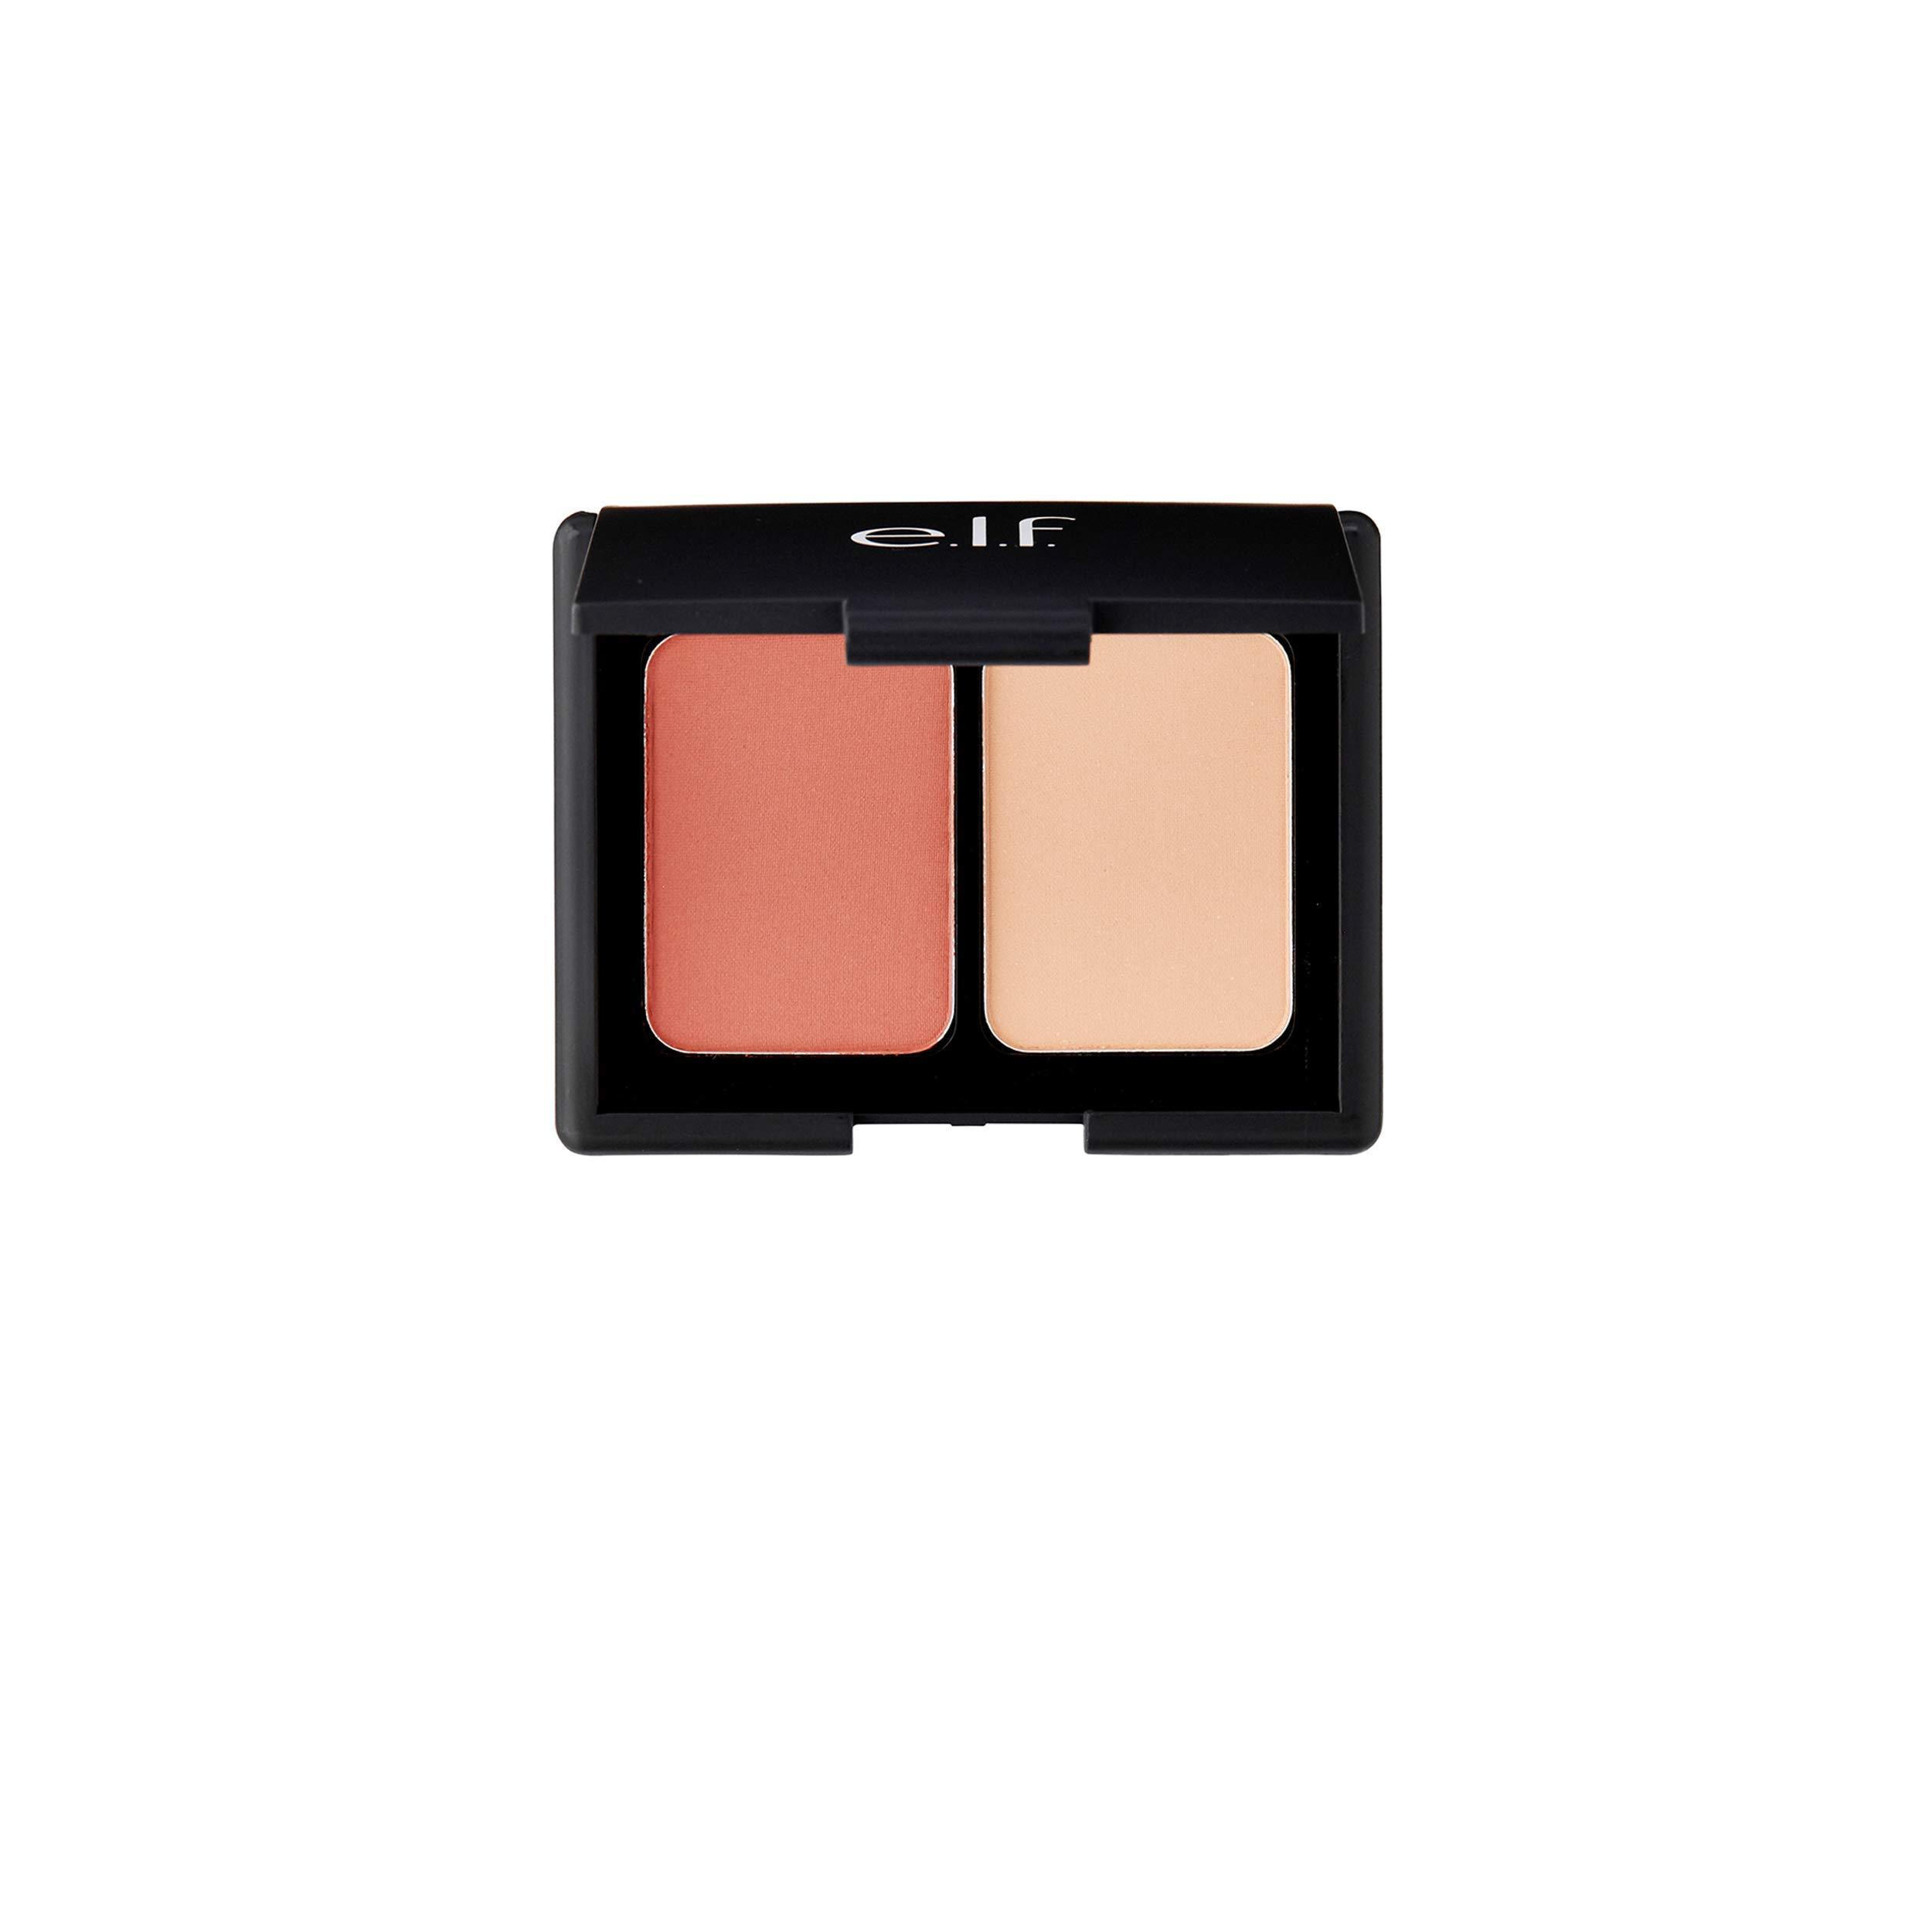 e.l.f. Matte Blush Duo Blendable Color Powder, Rosy Flush, 0.30 Ounce